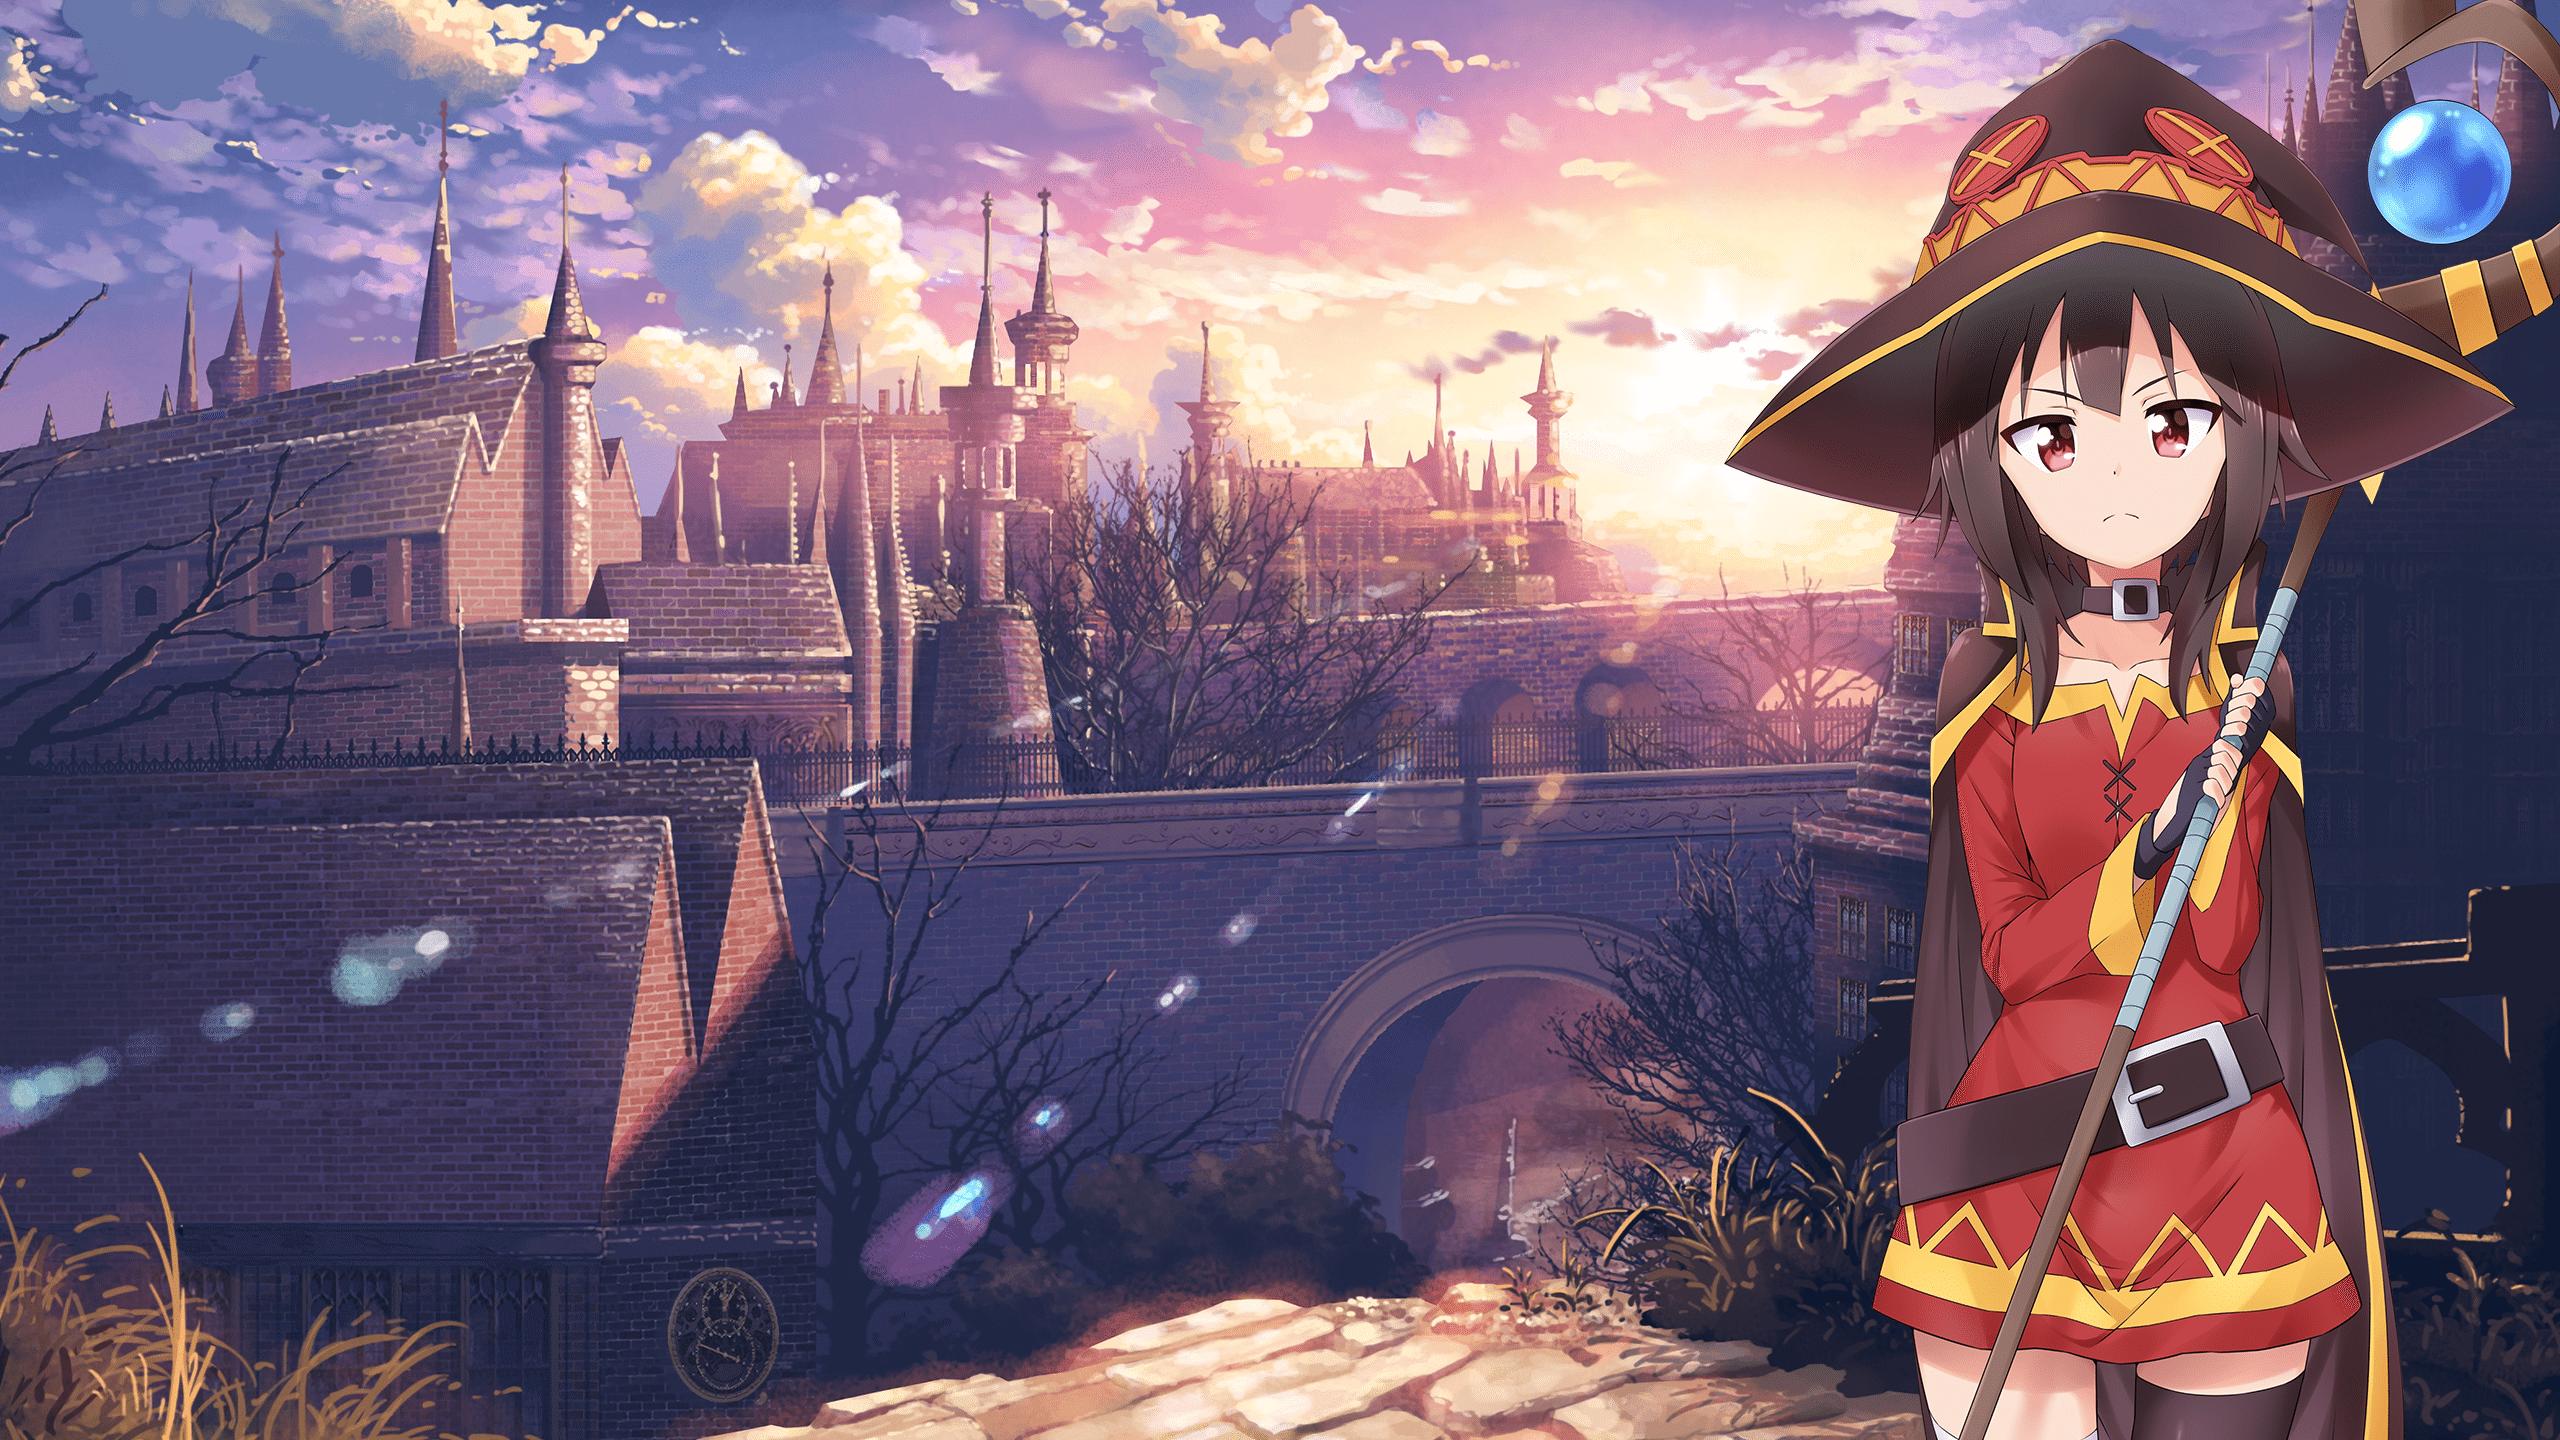 Megumin Konosuba 2560x1440 1920x1080 Hq Backgrounds Hd Wallpapers Gallery Gallsource C Background Hd Wallpaper Hd Anime Wallpapers Game Illustration